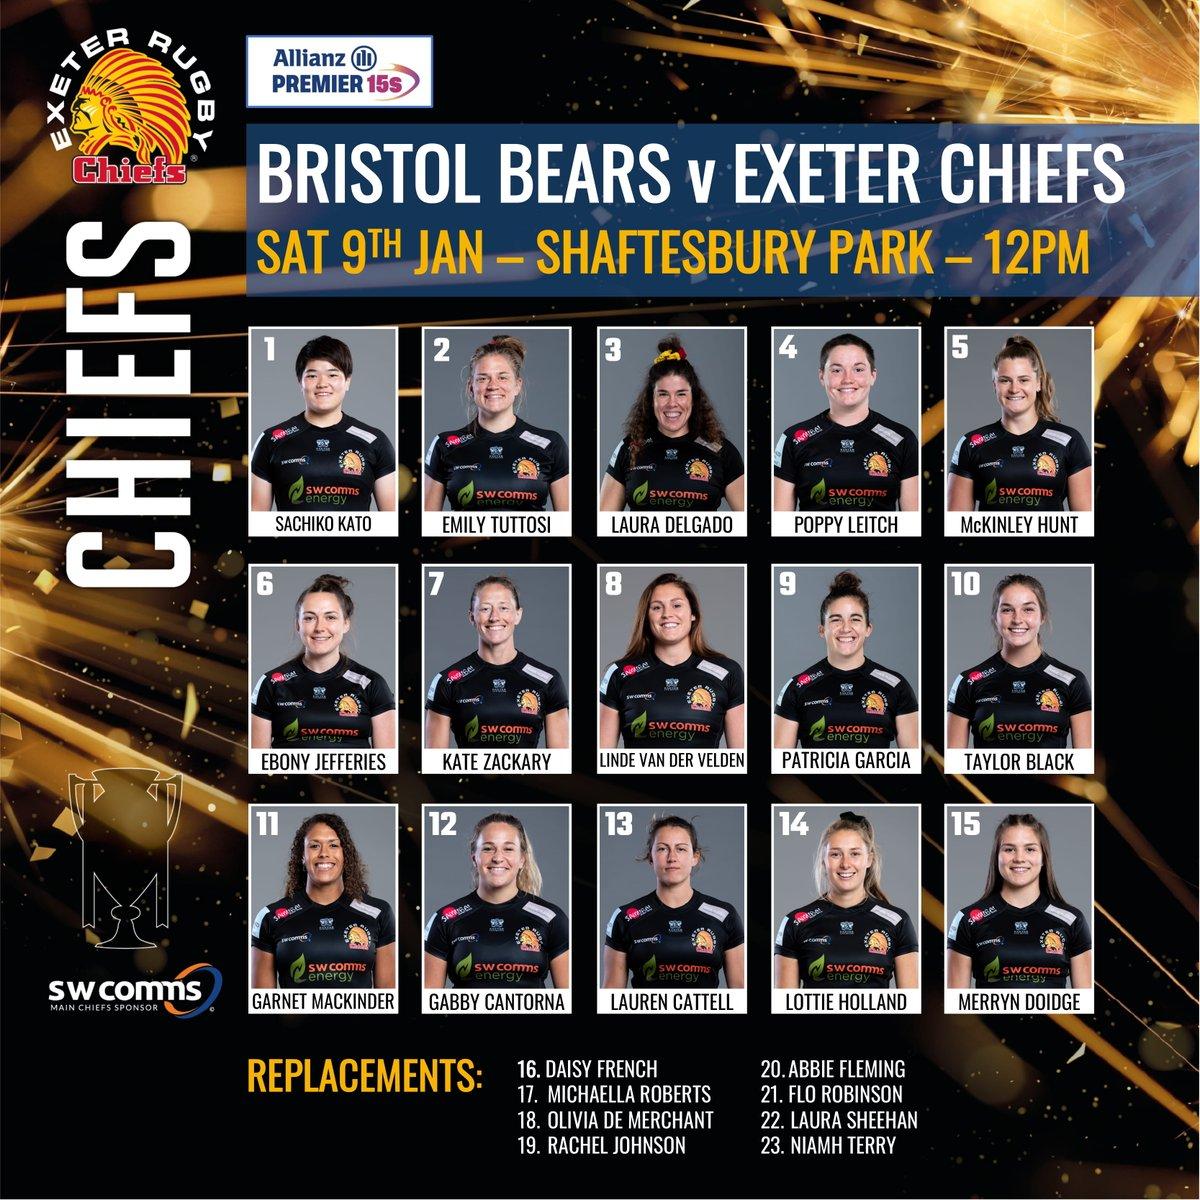 Exeter Chiefs @ExeterChiefs